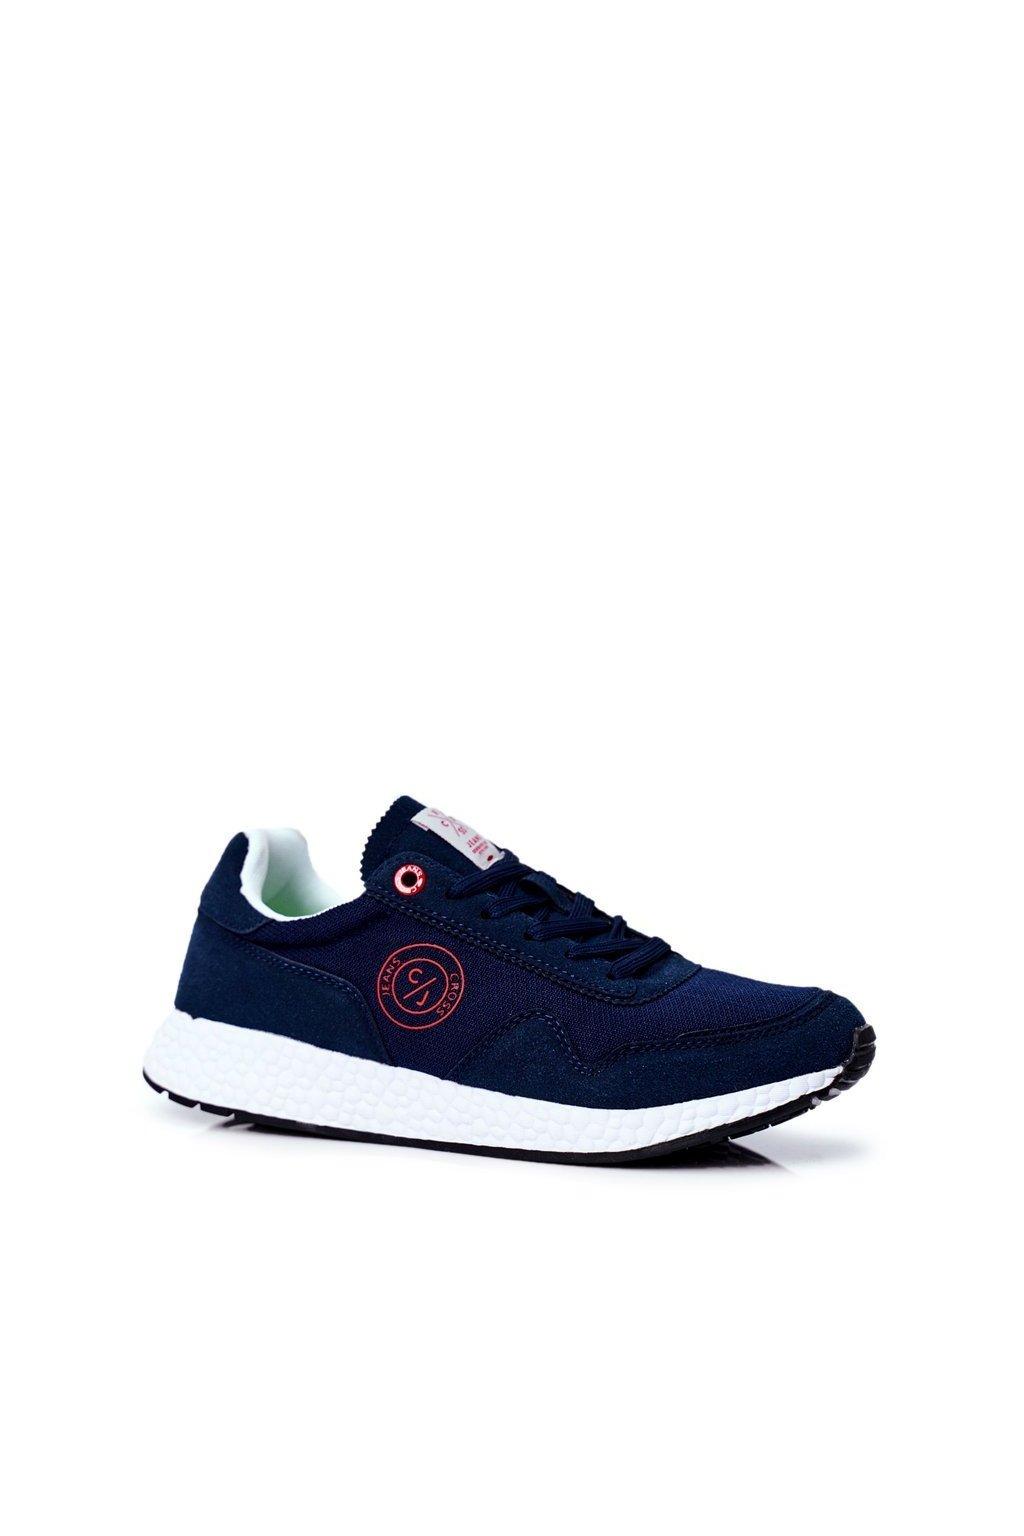 Modrá obuv kód topánok FF1R4009C NAVY